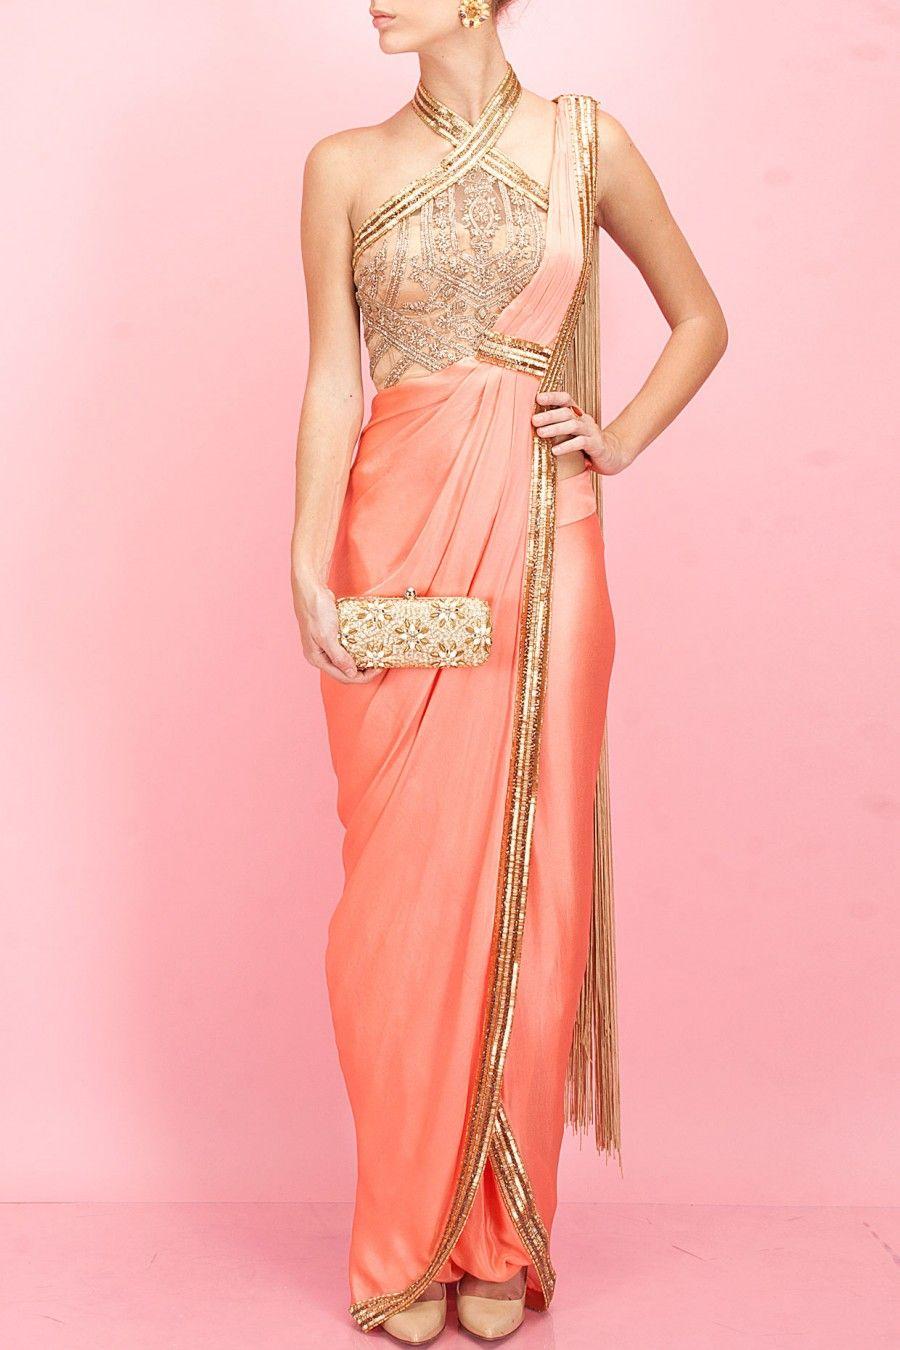 SONAAKSHI RAAJ Coral and gold egyptian embroidery pant-sari | Dress ...